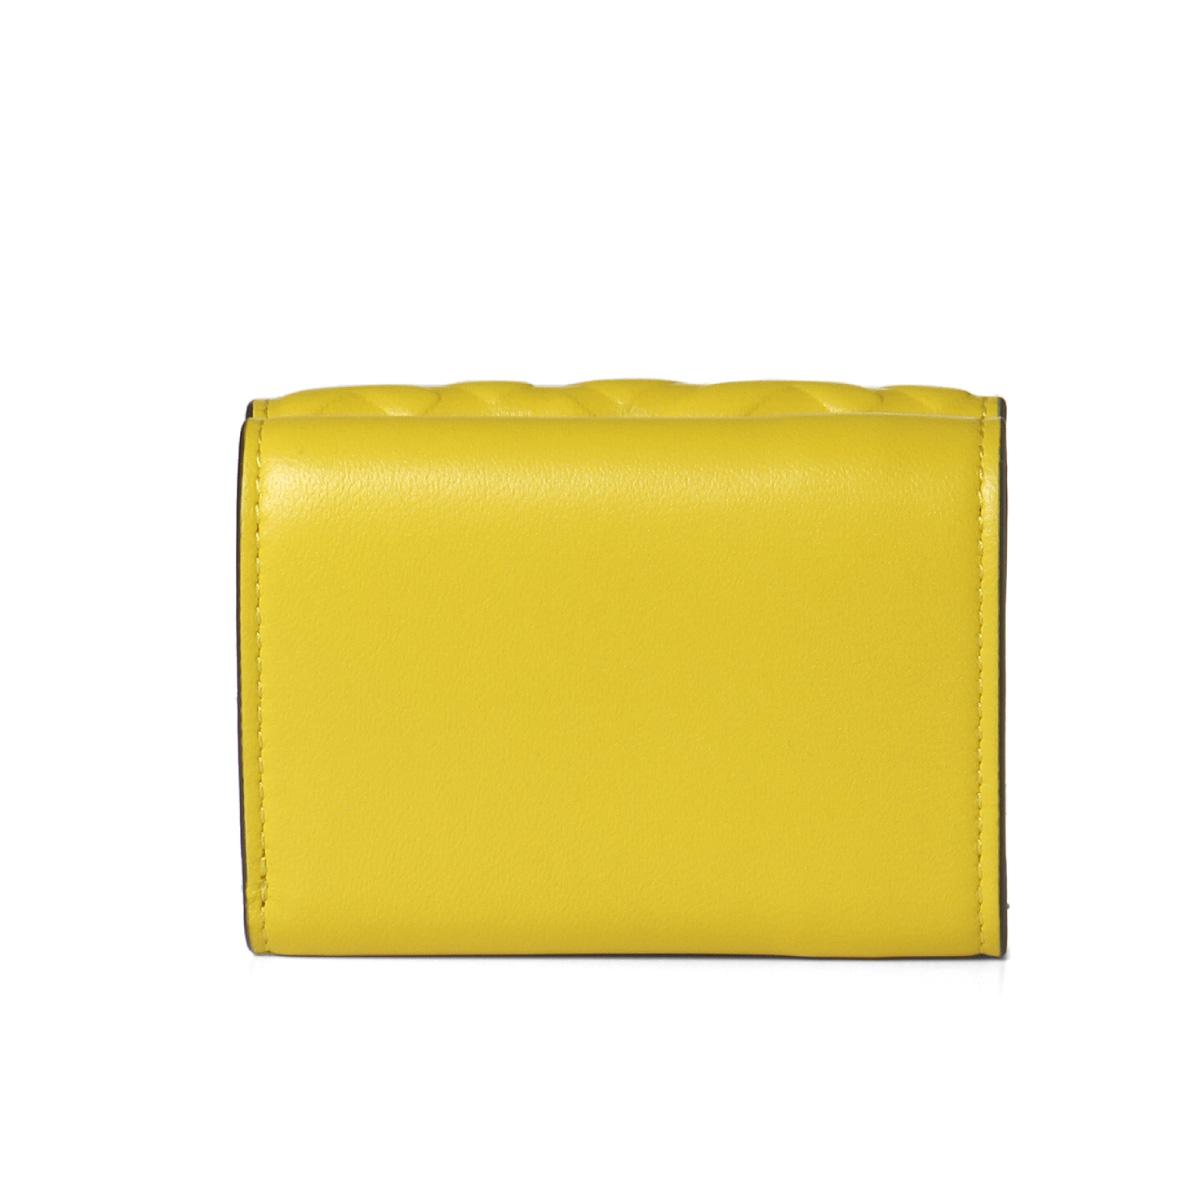 FENDI フェンディ | 三つ折り財布 マイクロ